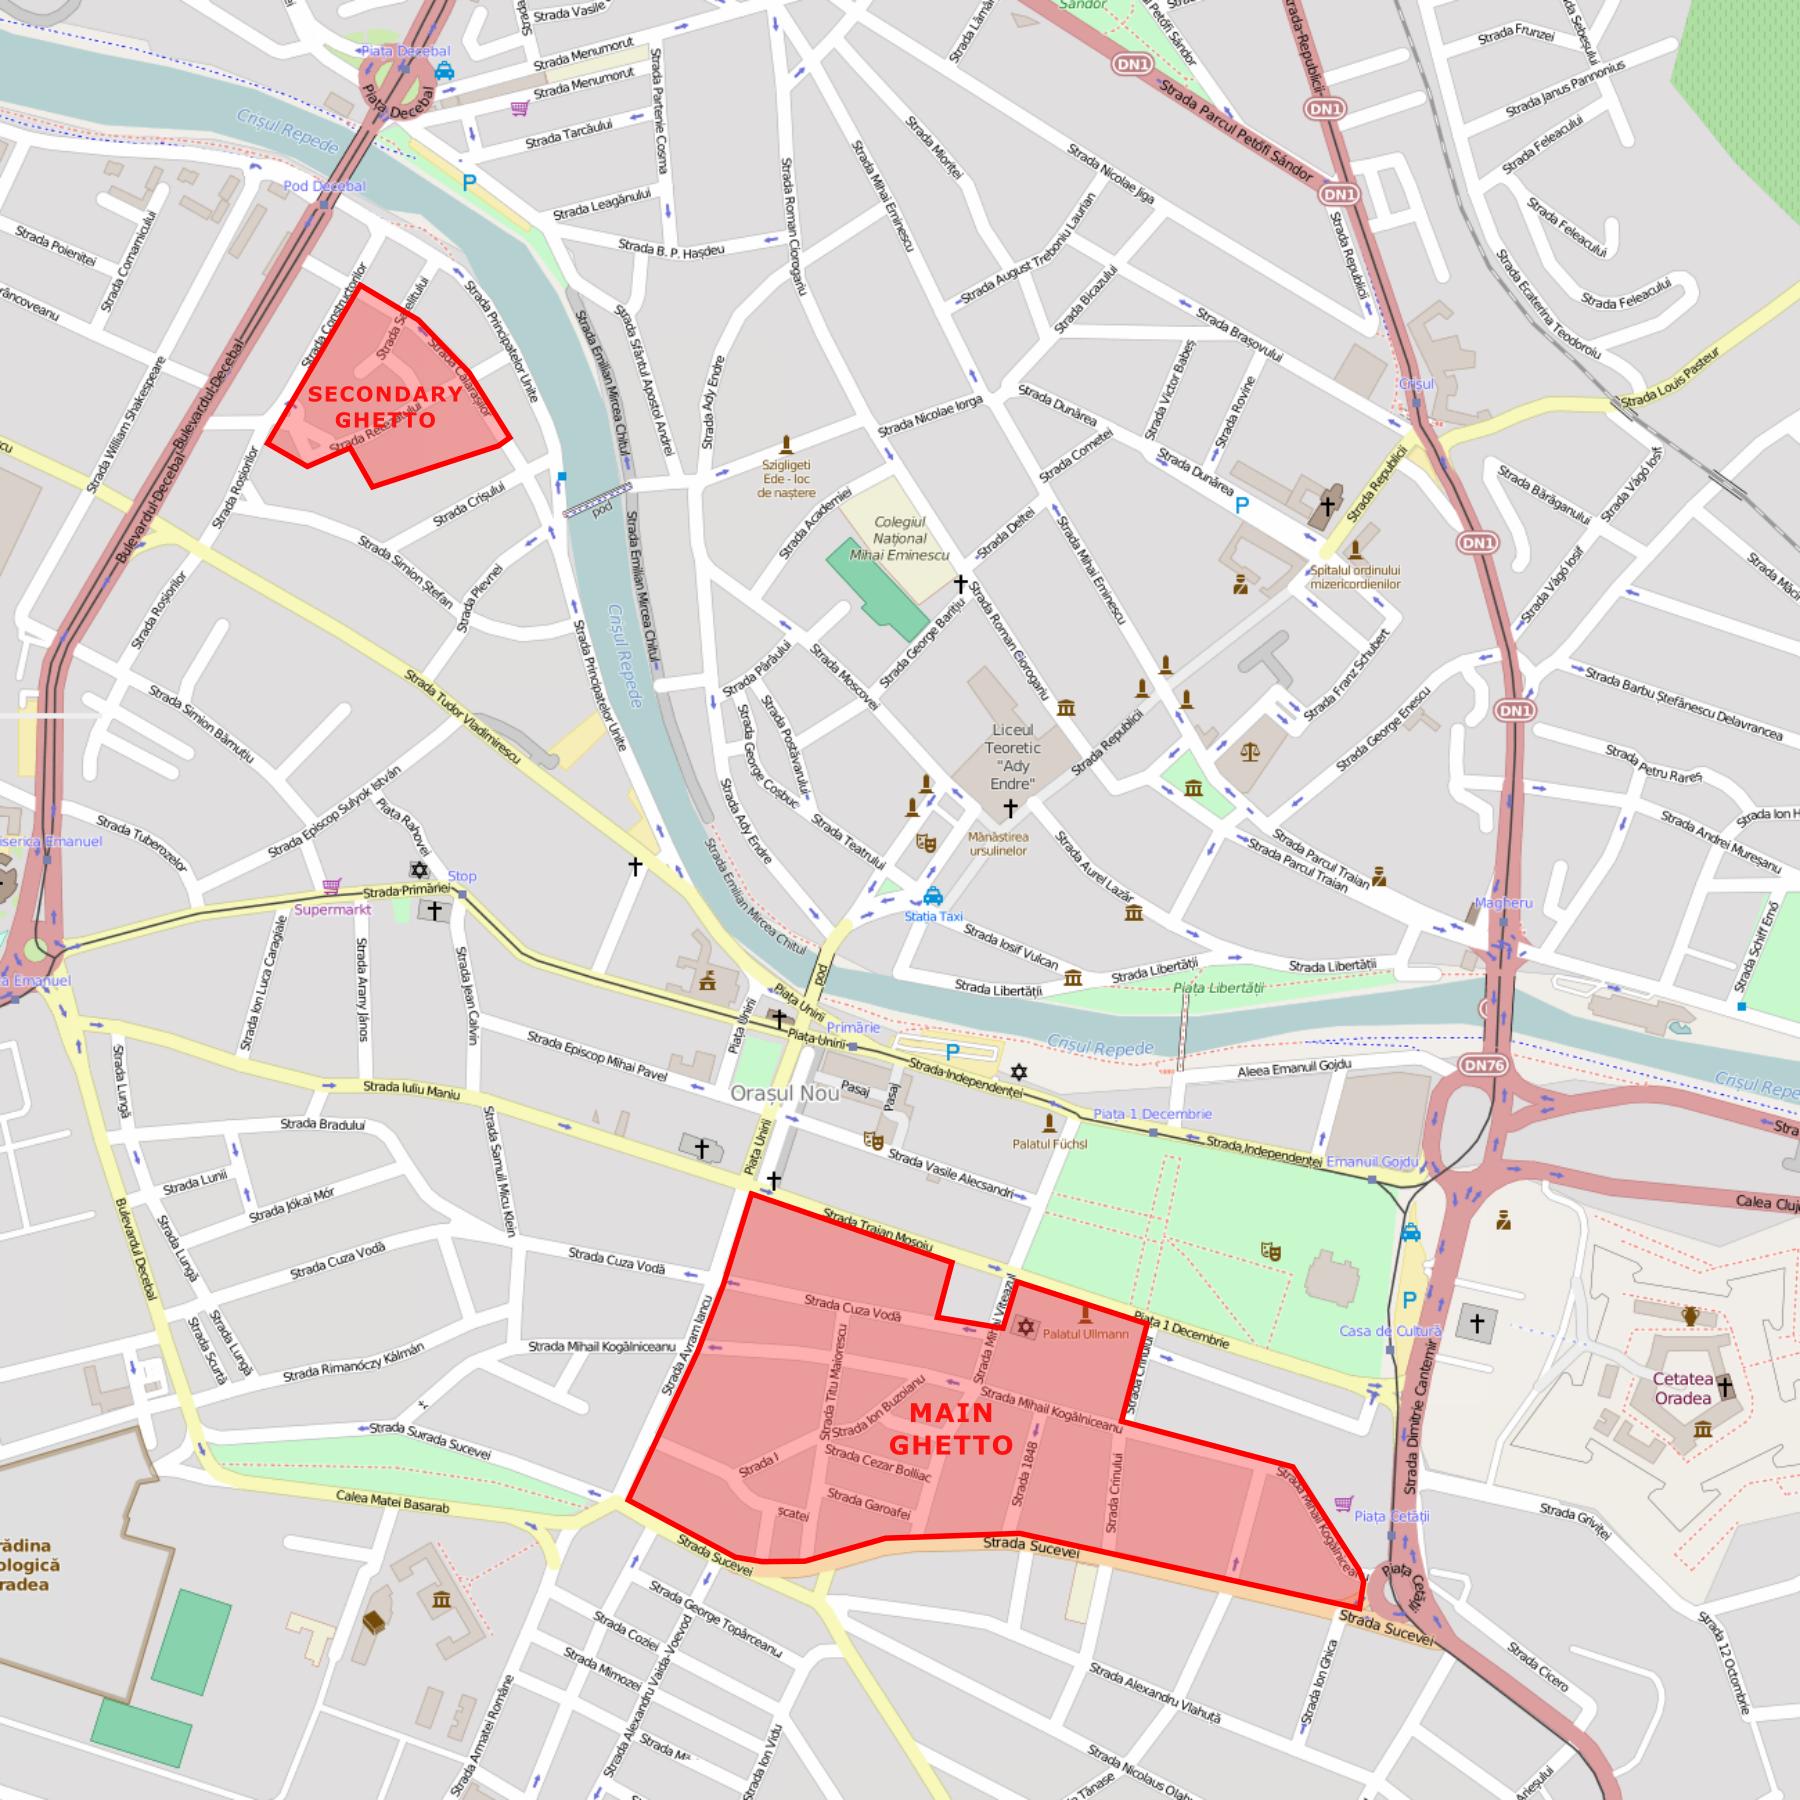 FileOradea Ghettopng Wikimedia Commons - Oradea map